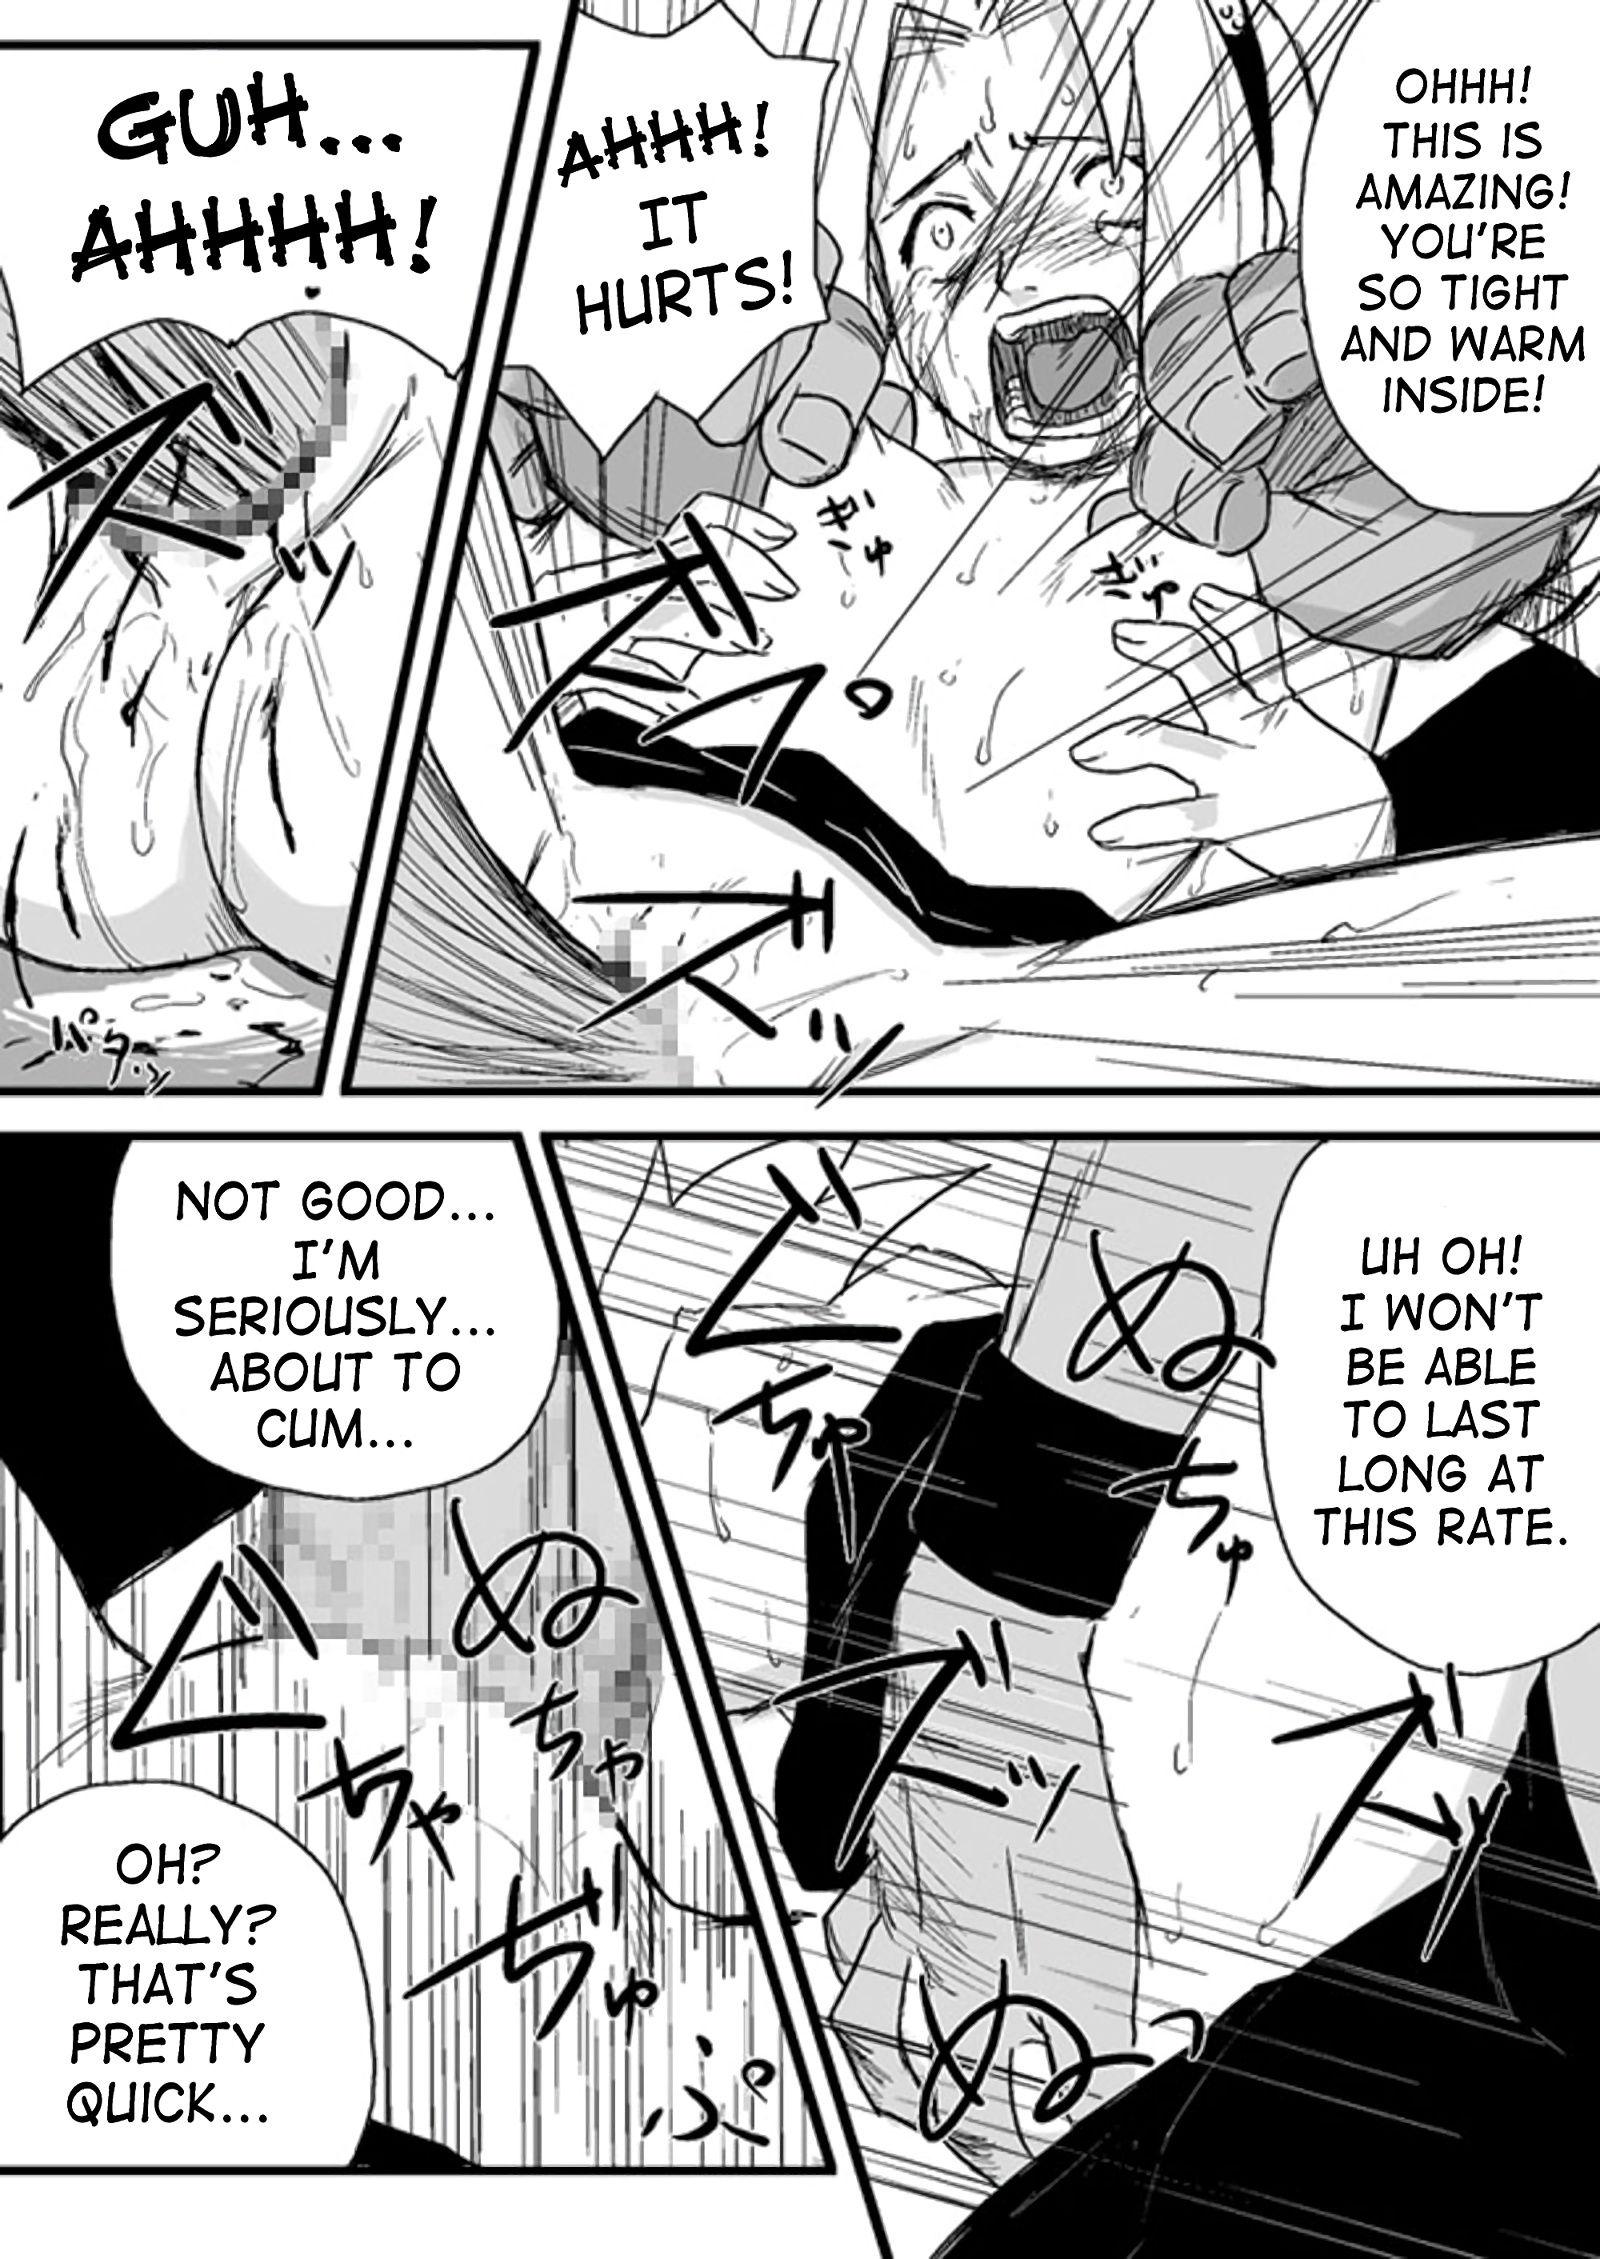 Ninja dependence vol. 1 hentai manga picture 12